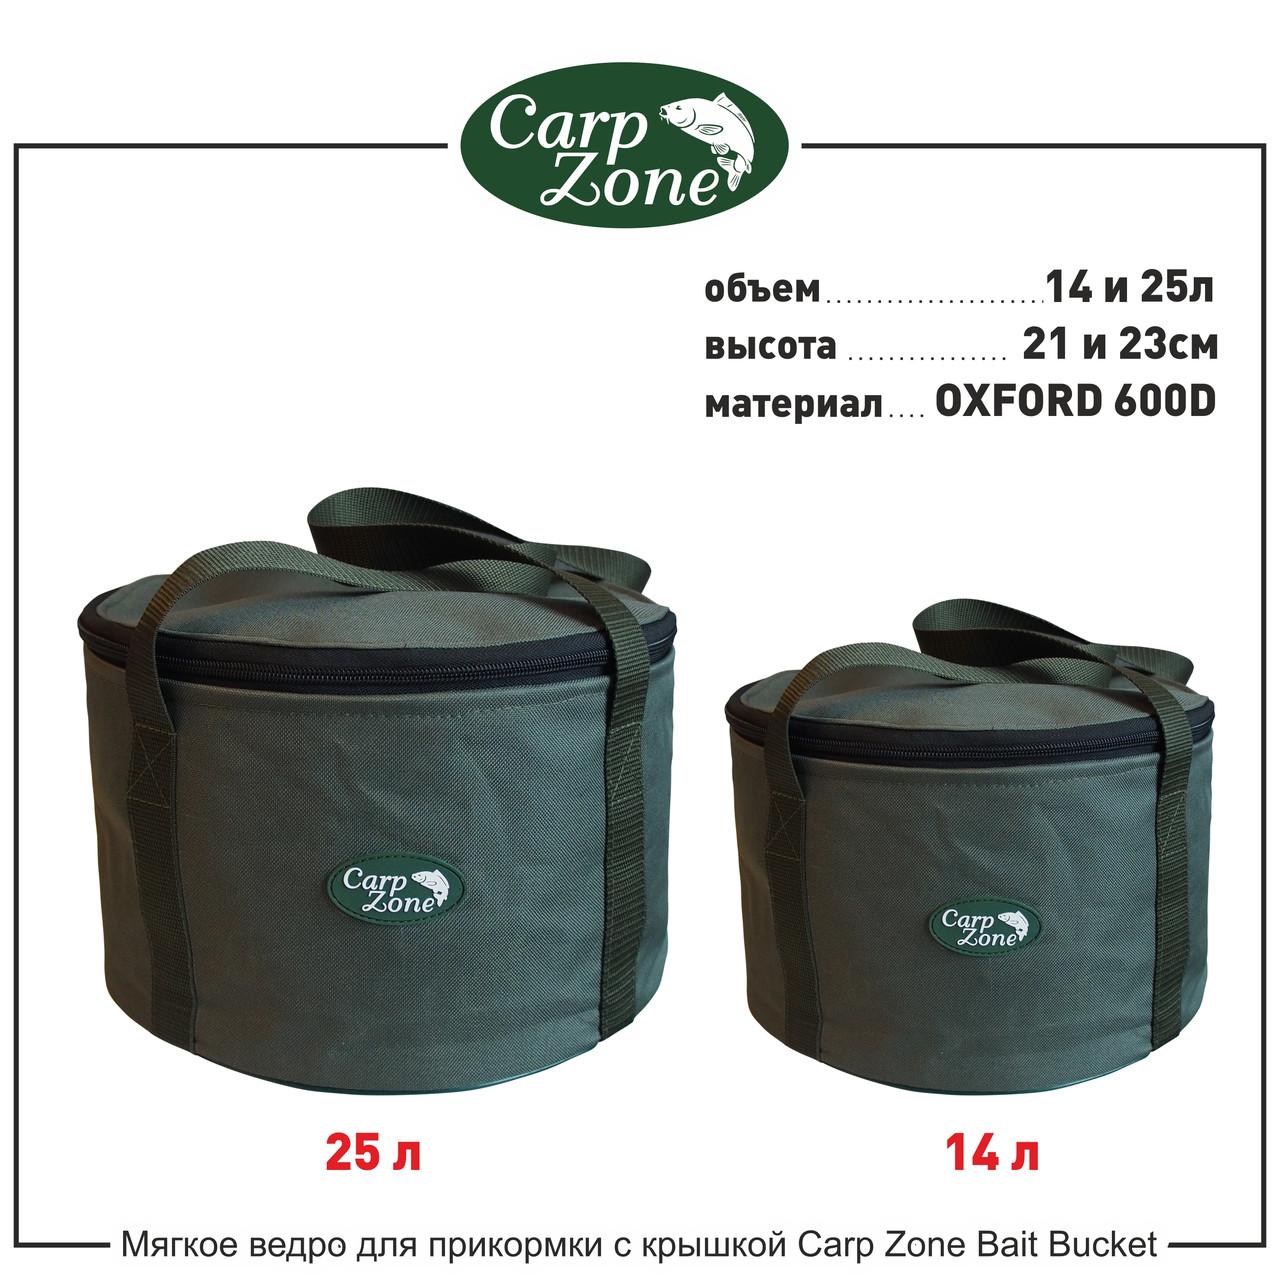 Мягкое ведро для прикормки с крышкой Carp Zone Bait Bucket